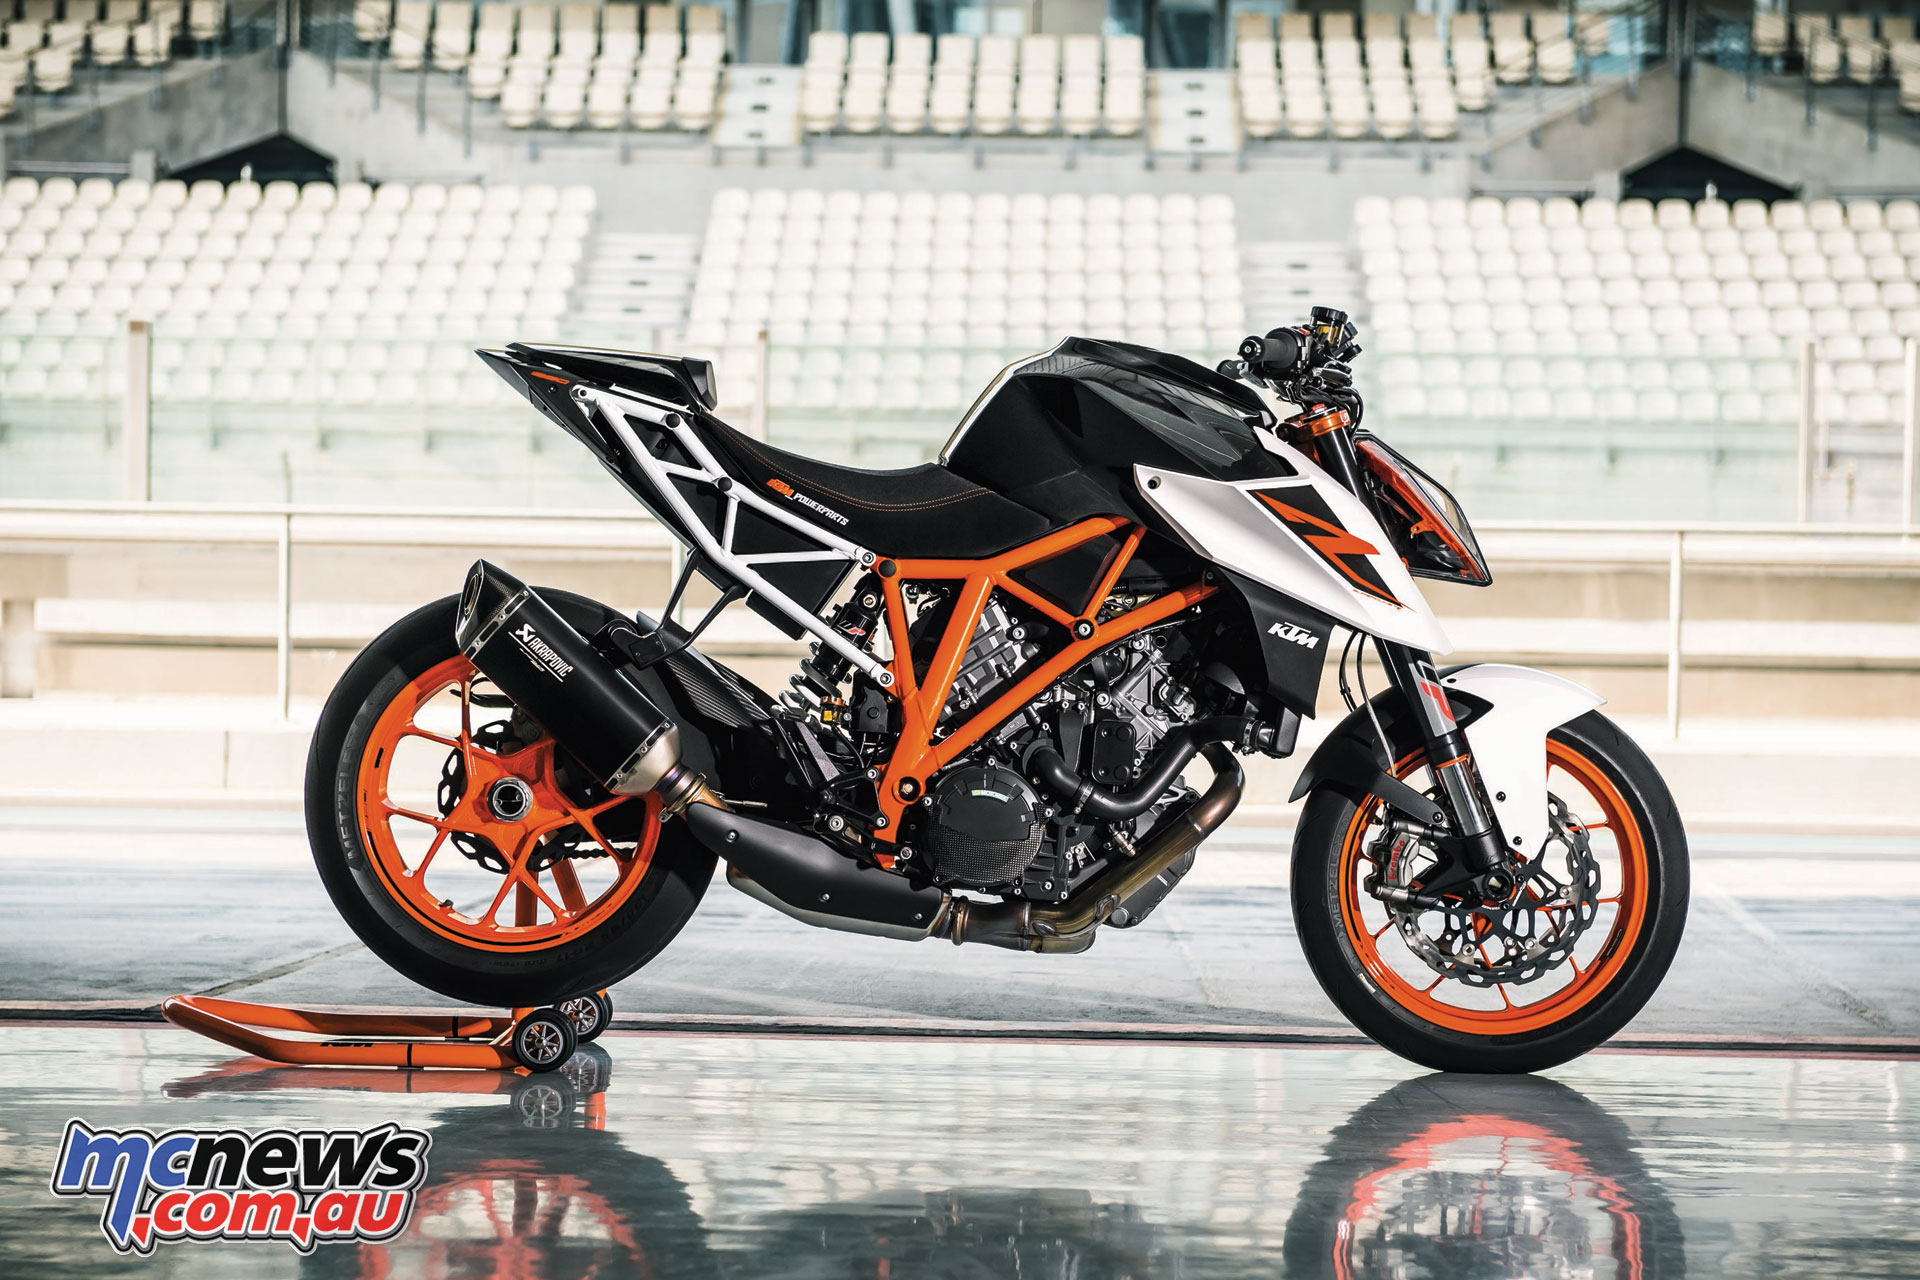 Ktm 1290 Super Duke R >> 2017 Ktm 1290 Superduke R Beast 2 0 Mcnews Com Au